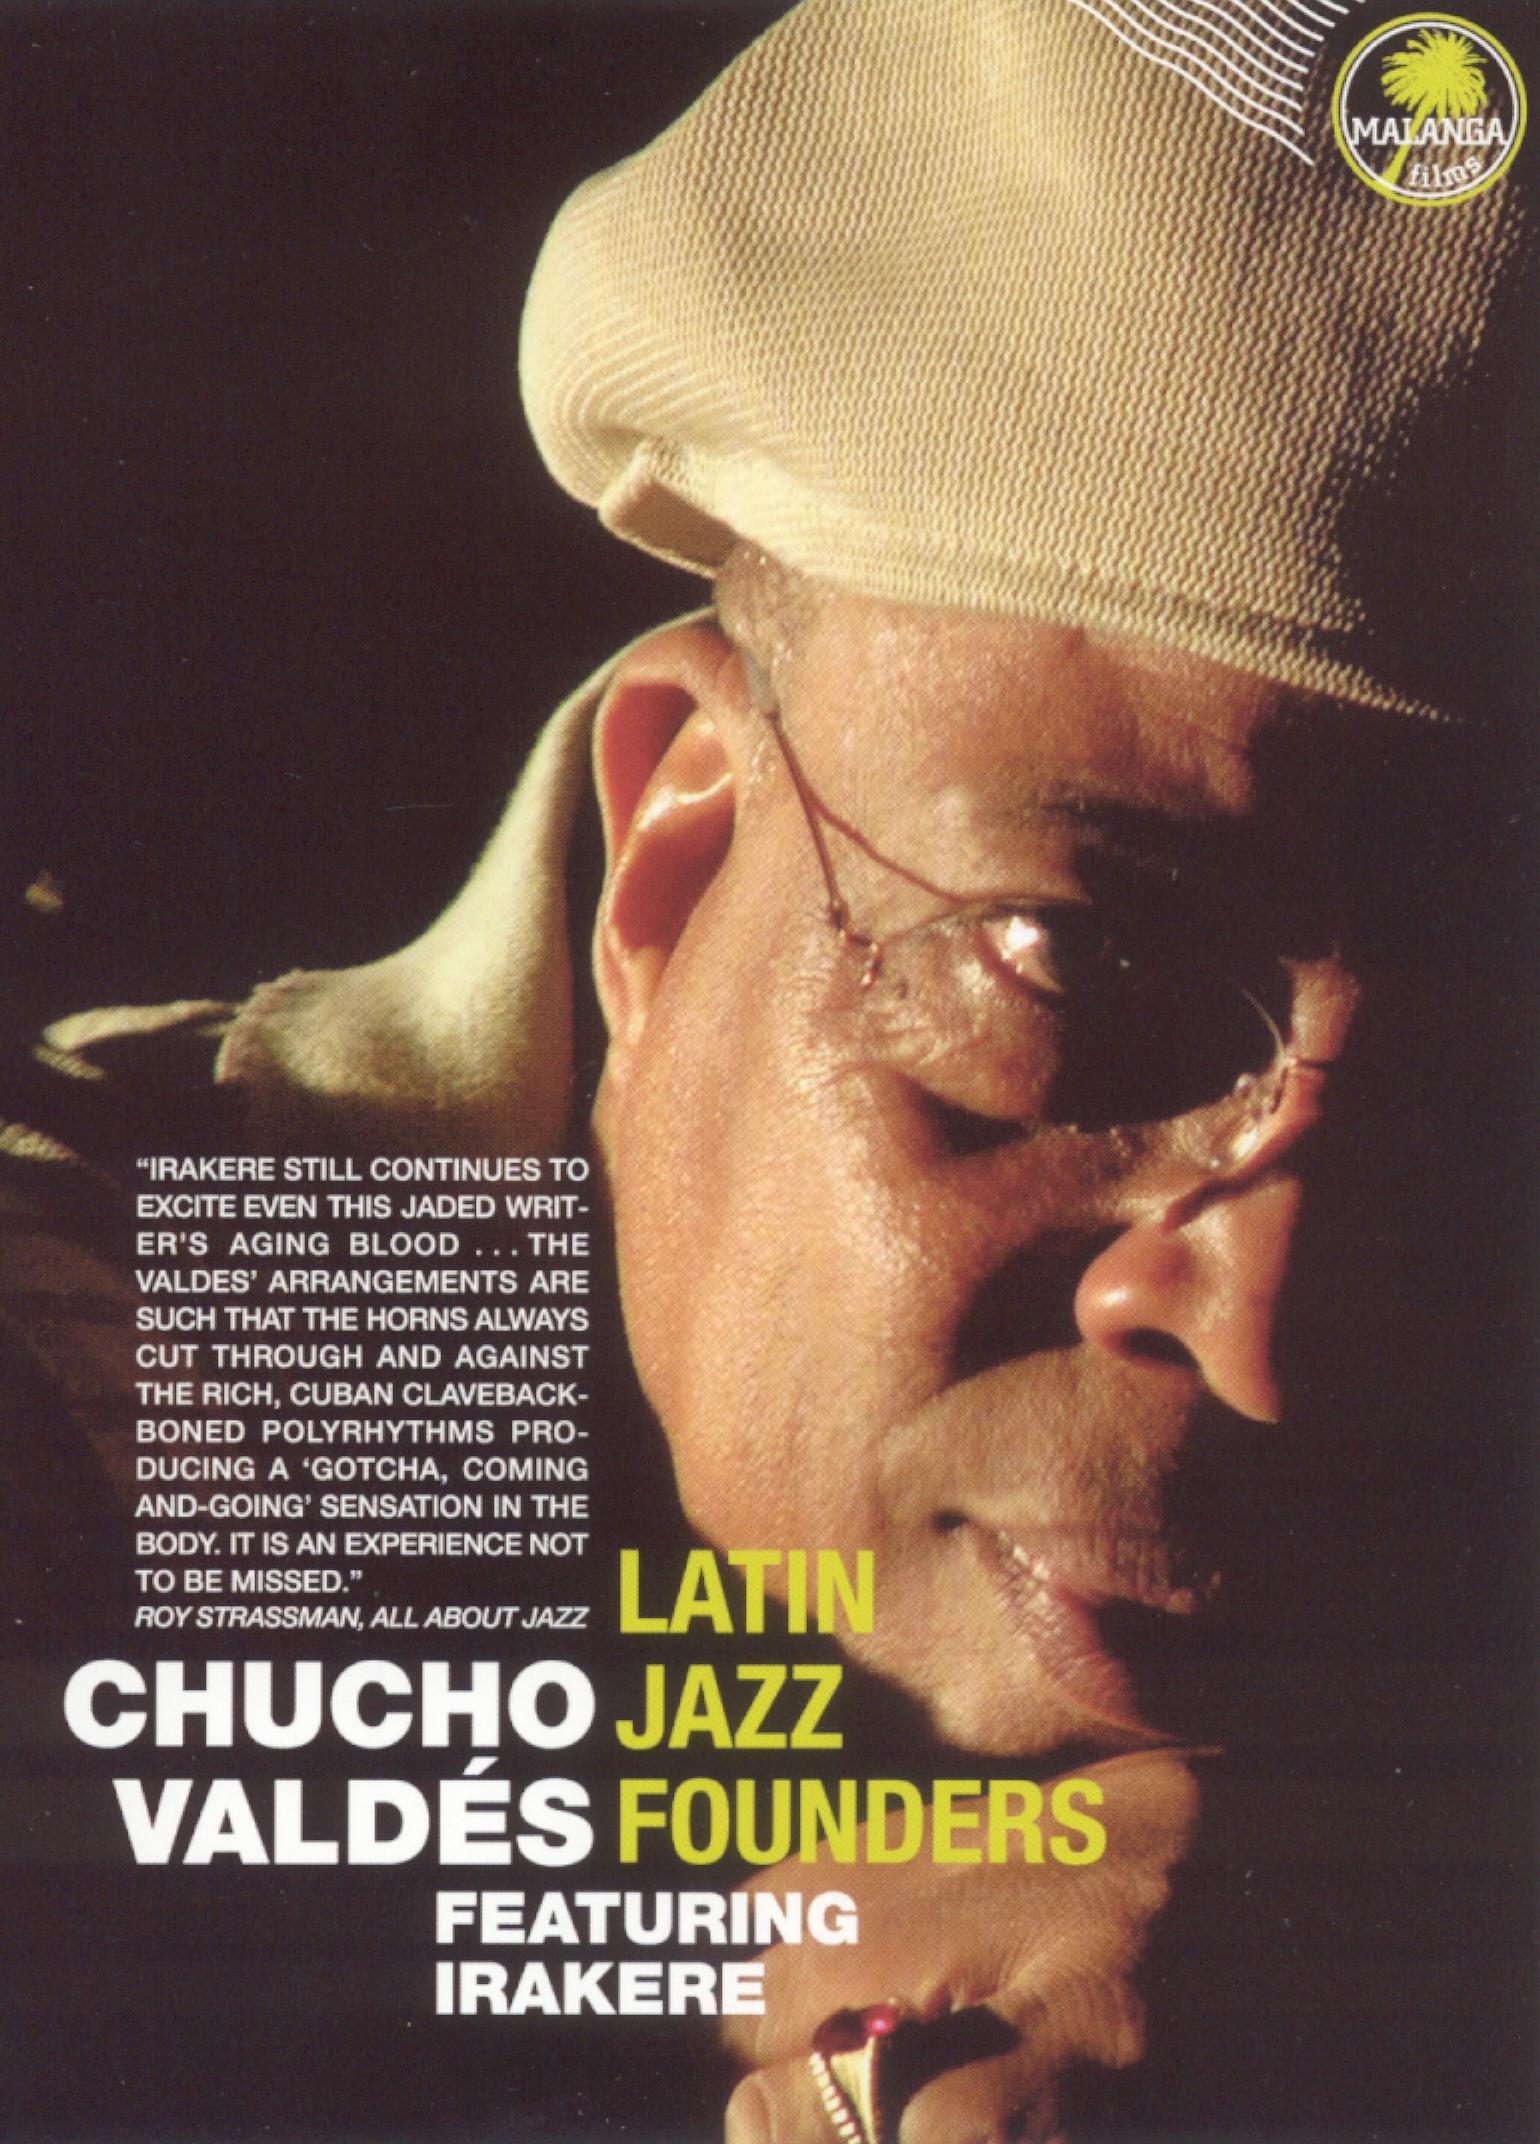 Chucho Valdes and Irakere: Latin Jazz Founders